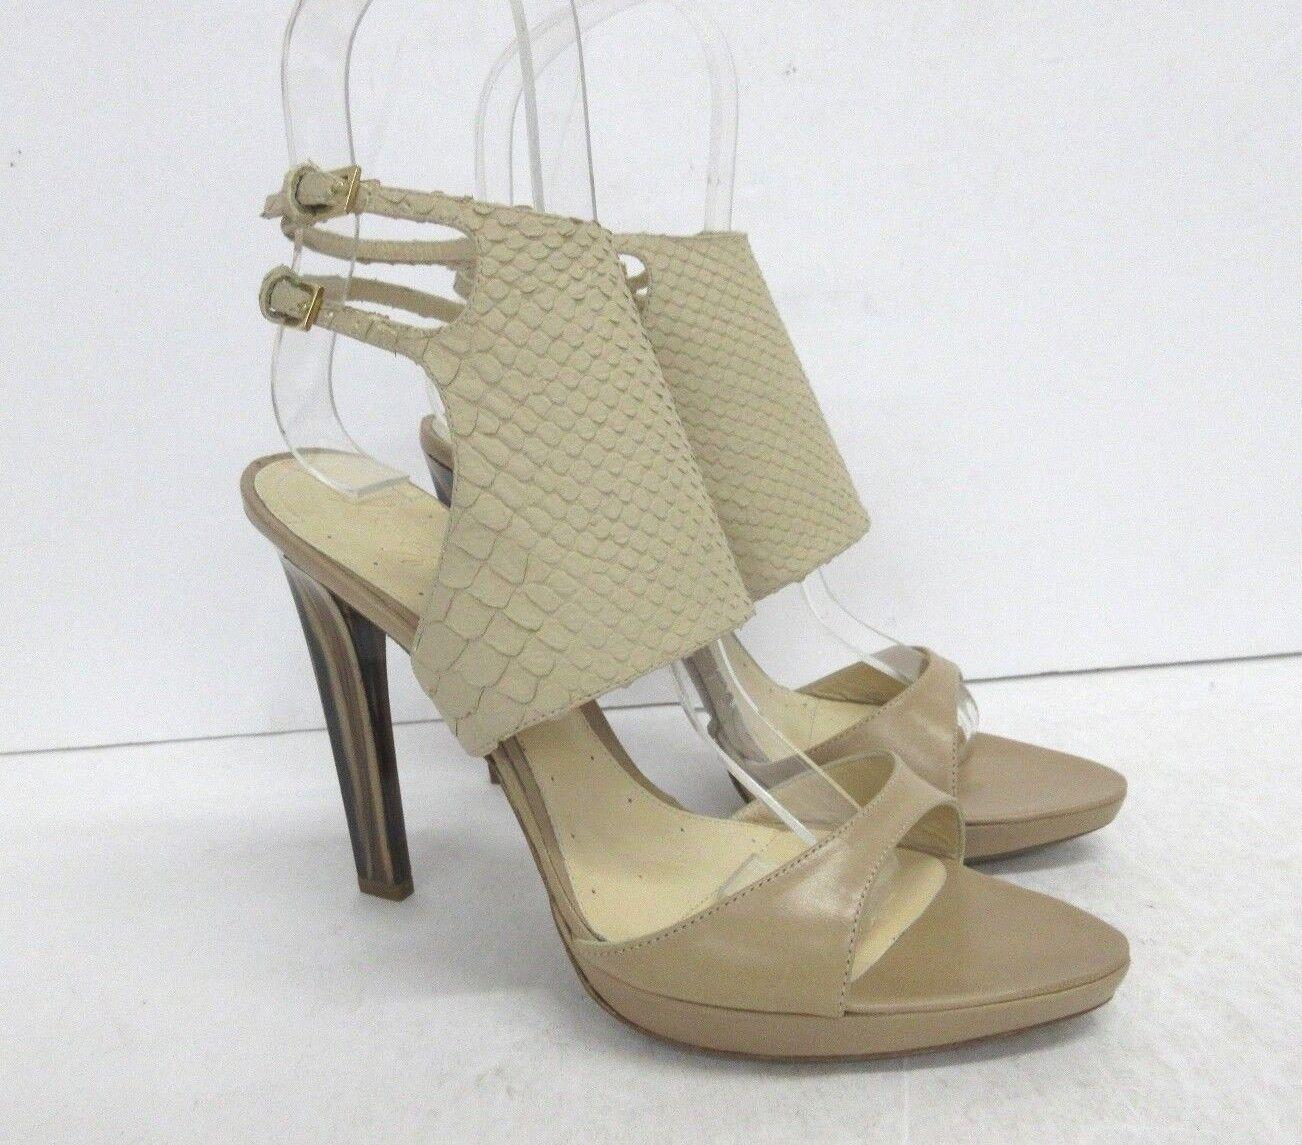 New MAX AZRIA Snake Embossed Marble Heel Sandals Beige Size: 39 EUR